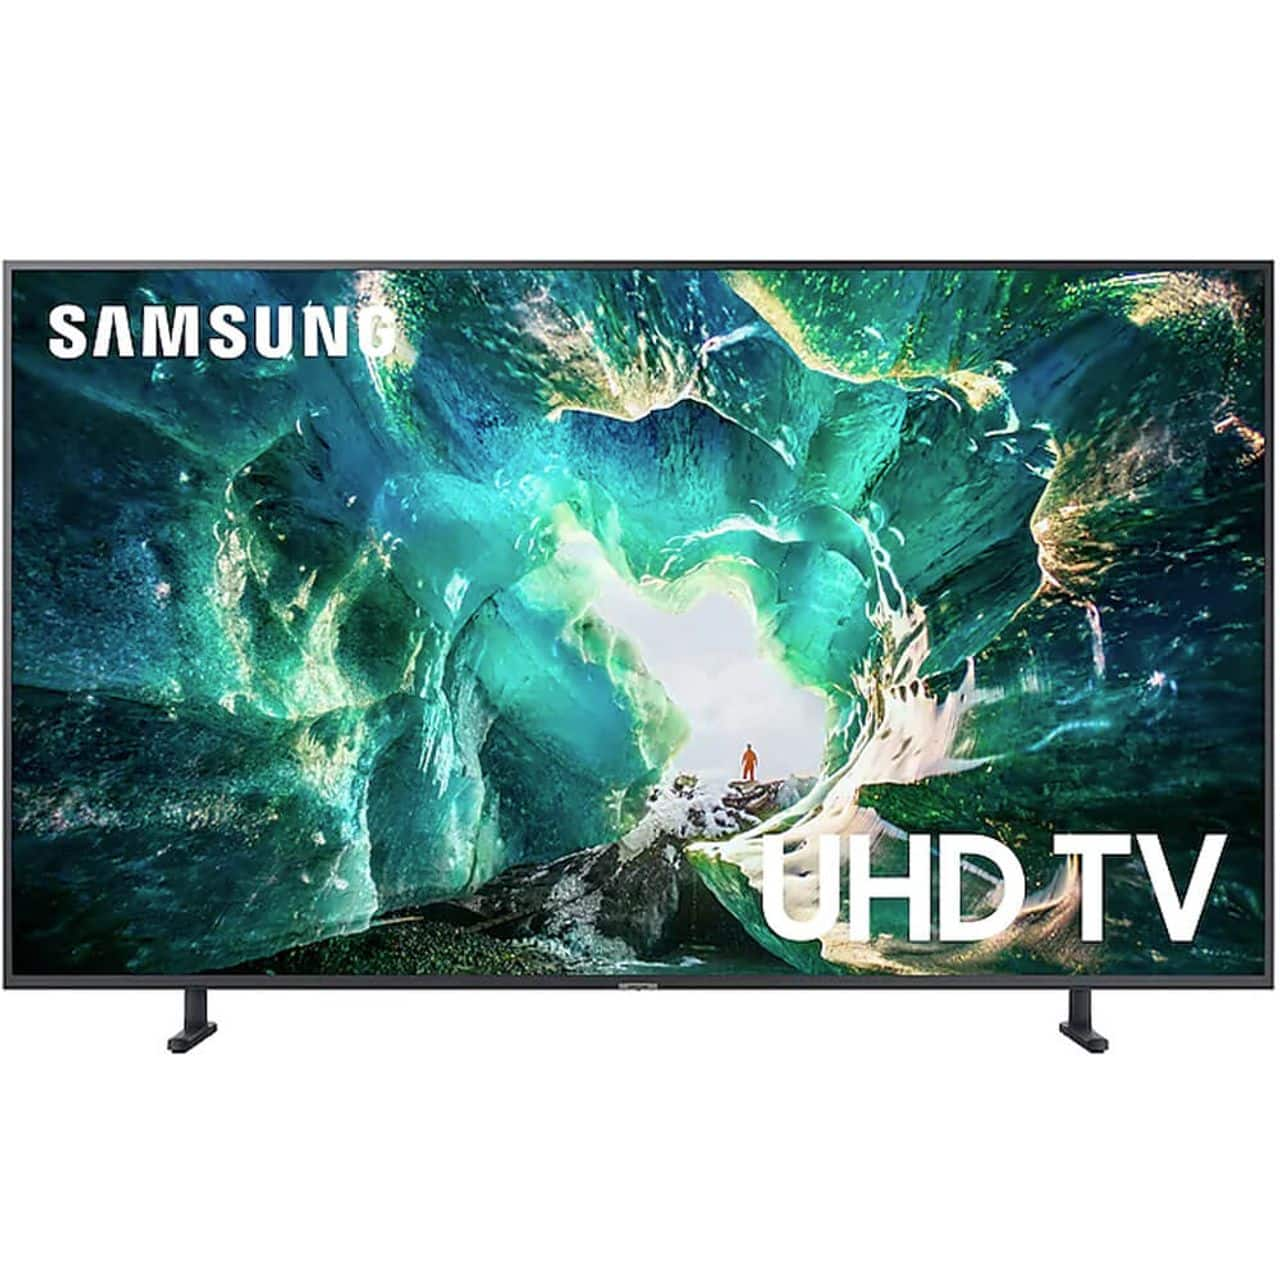 "Samsung 49"" Class RU8000 Series Smart 4K UHD TV UN49RU8000FXZA – $519 + Free Shipping"